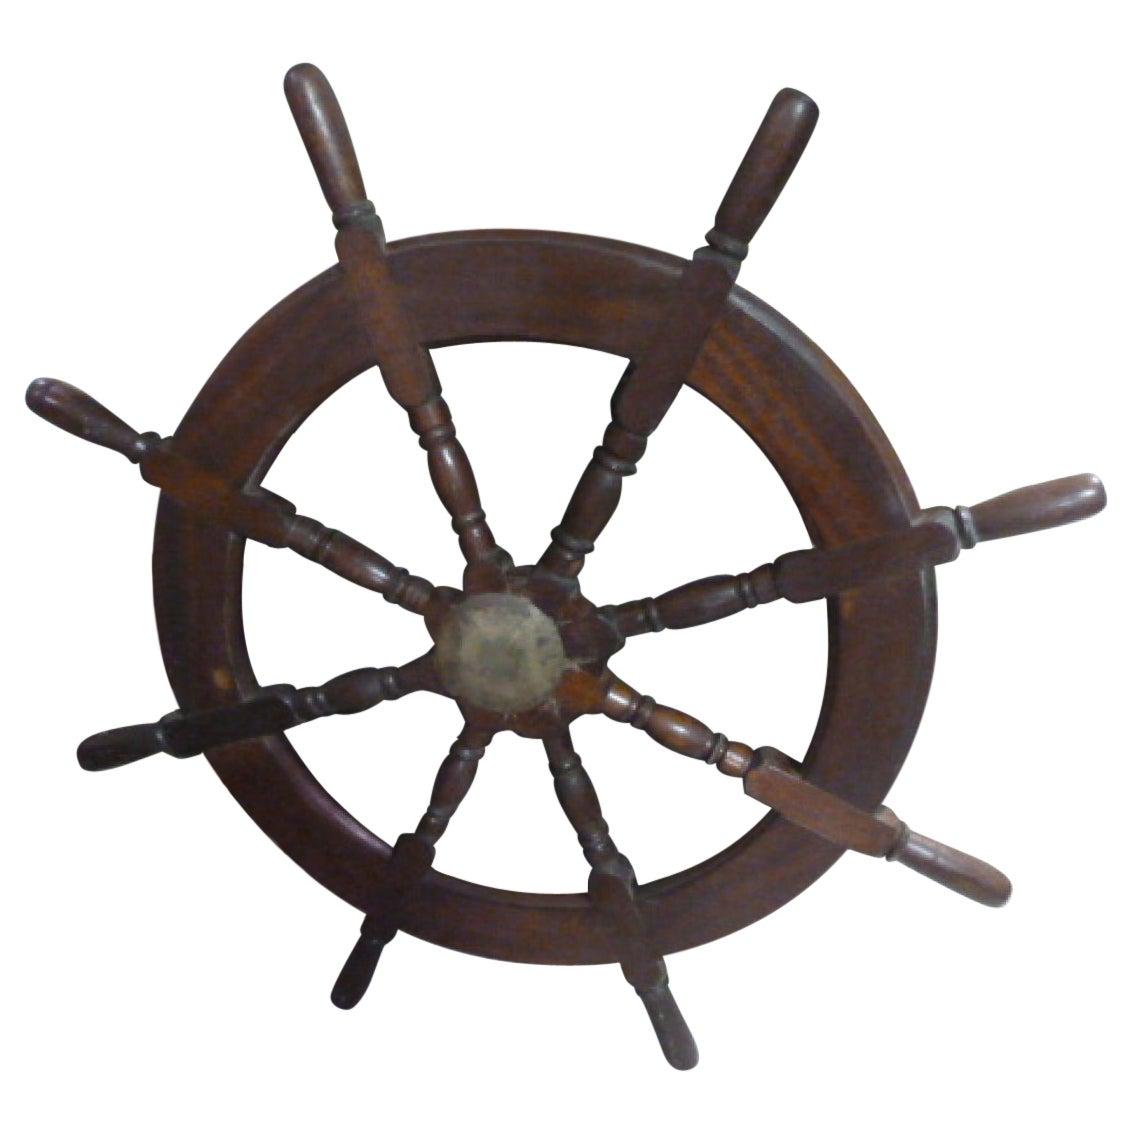 Original Ship's Wheel, 20th Century